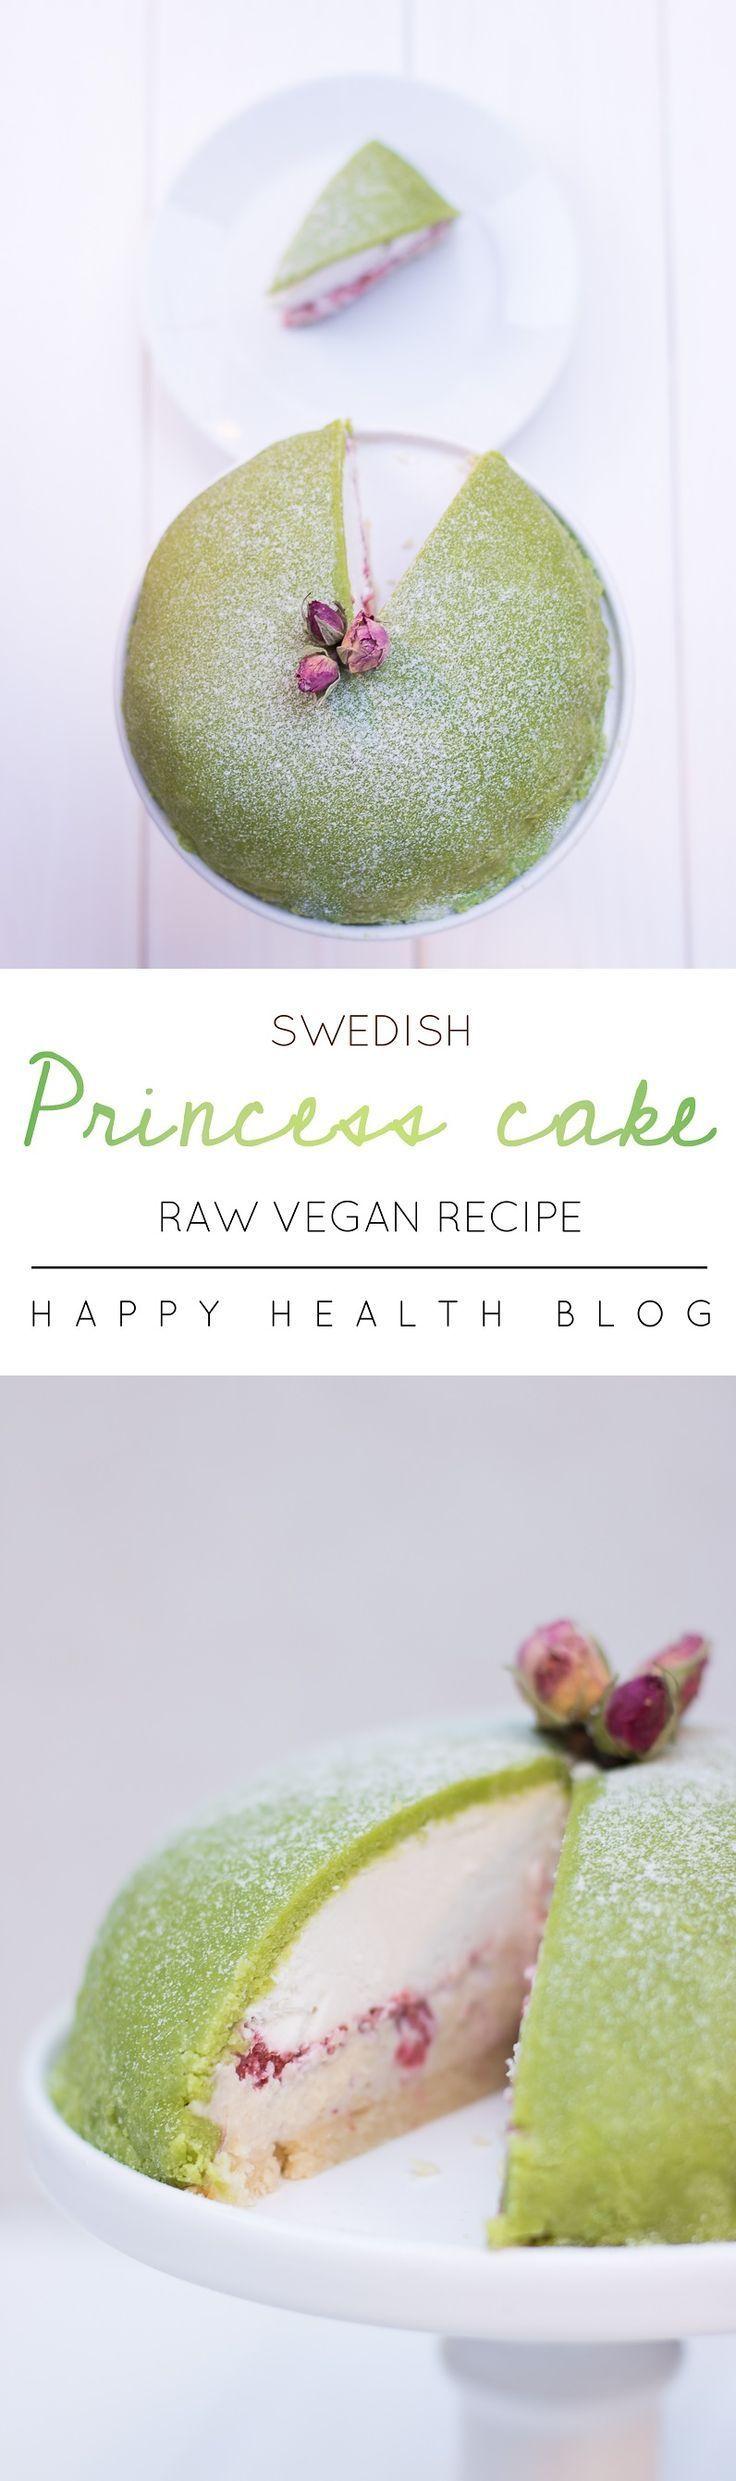 Raw vegan Swedish princess cake - happyhealthblog - Photo Natalie Yonan